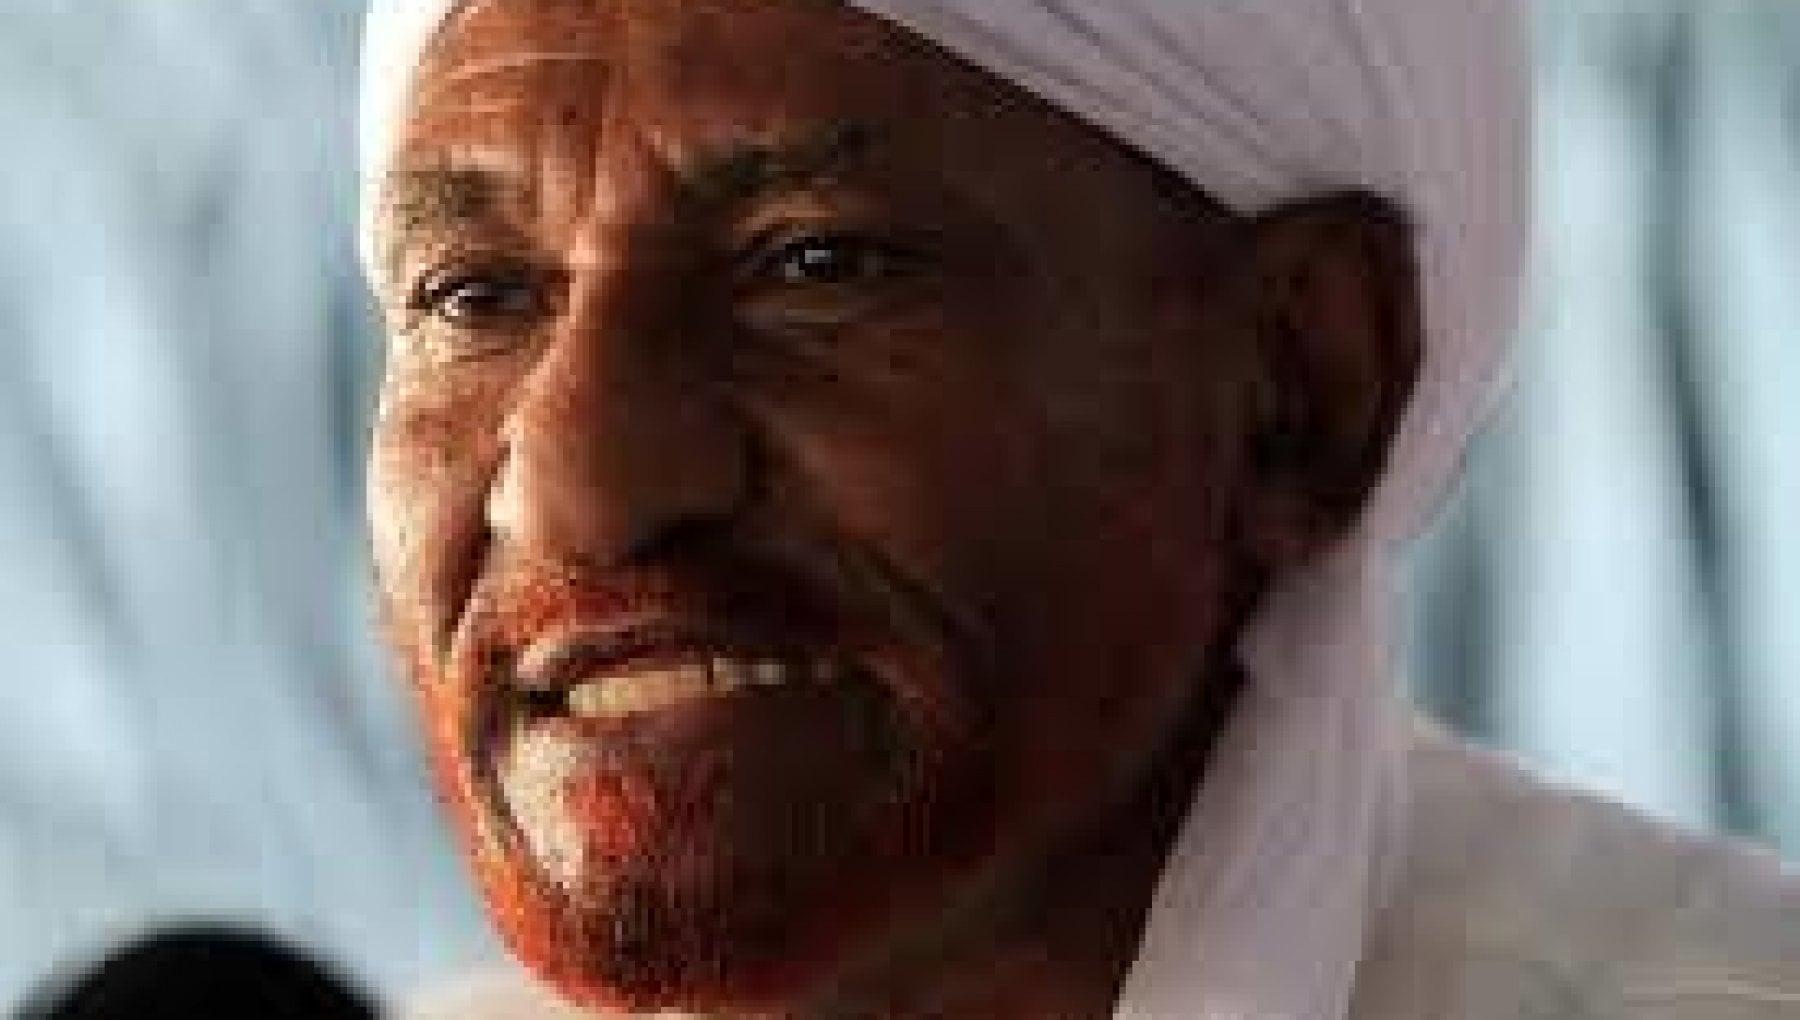 035730602 b8f8e822 d472 470b b4ac ebf8468b760a - Covid: Sudan, muore a 84 anni l'ex primo ministro Sadek al-Mahd